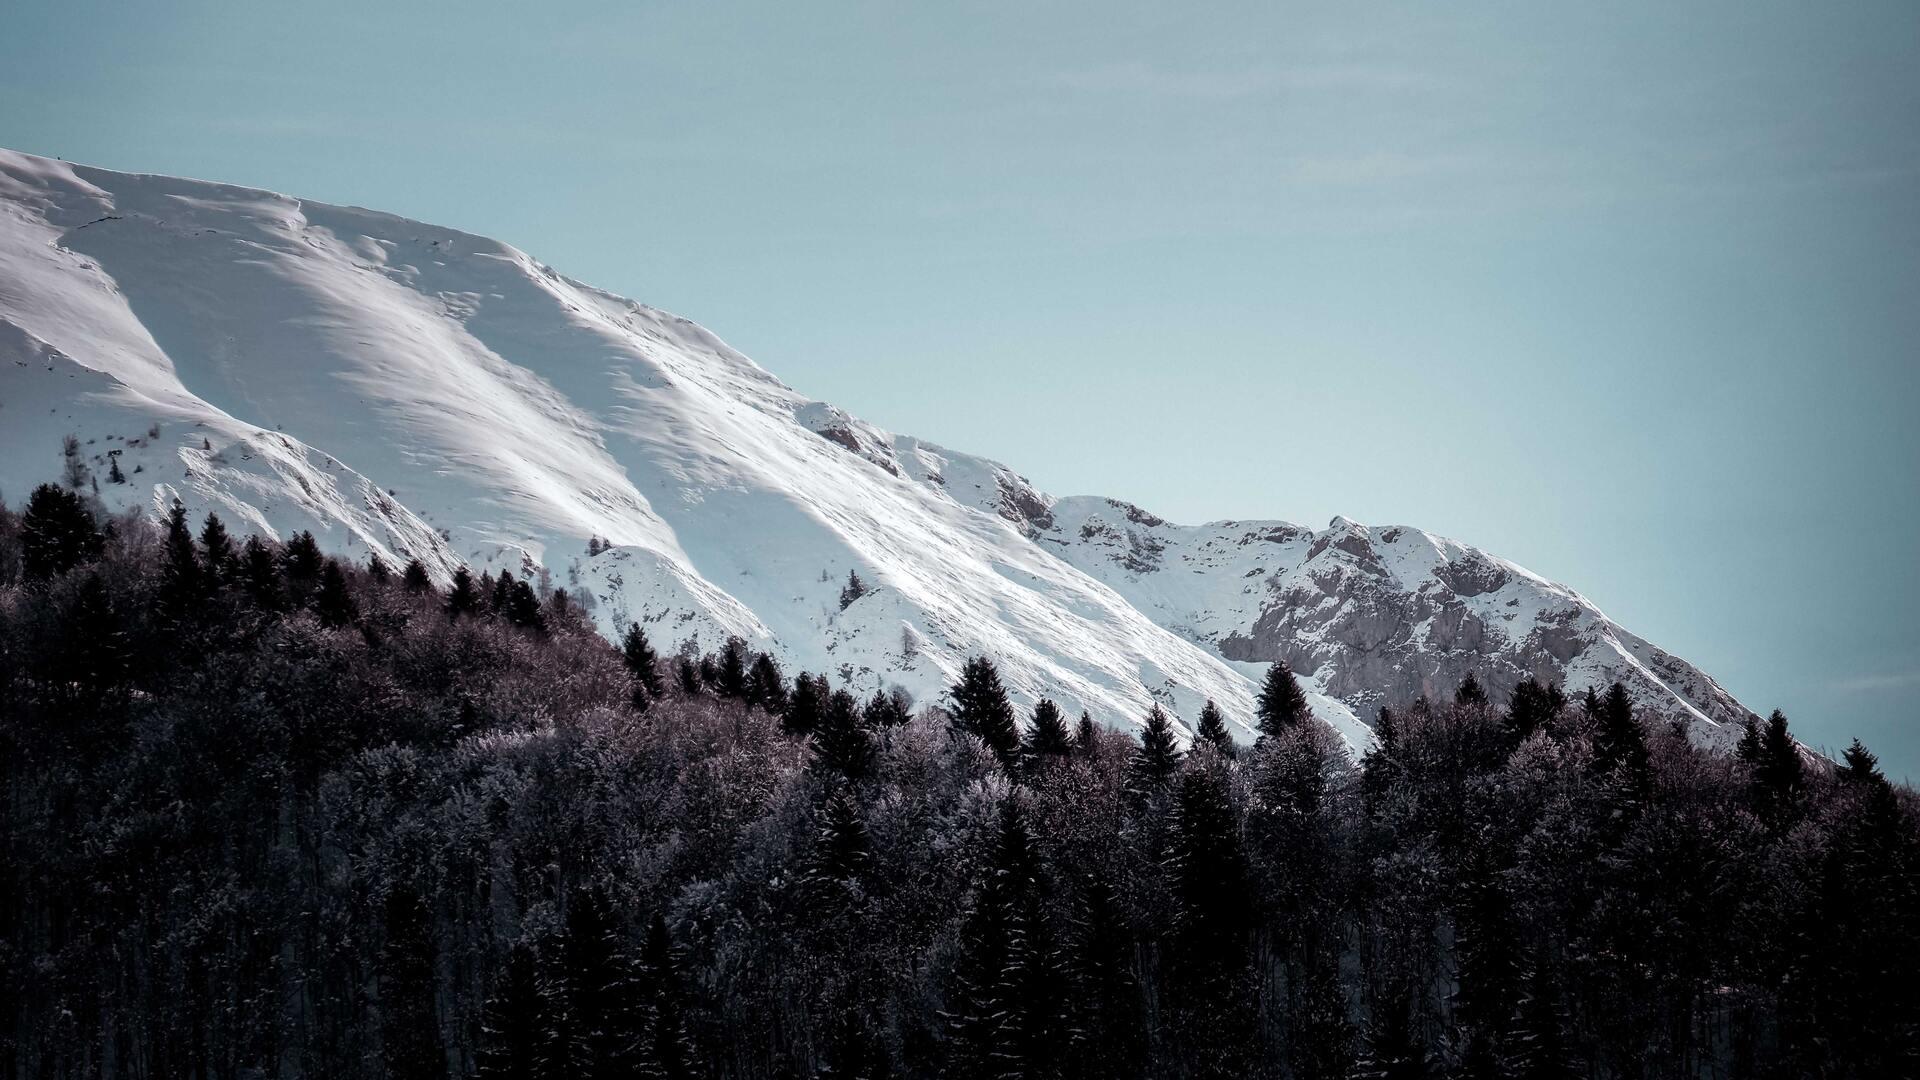 snow-covered-mountains-landscape-5k-3c.jpg